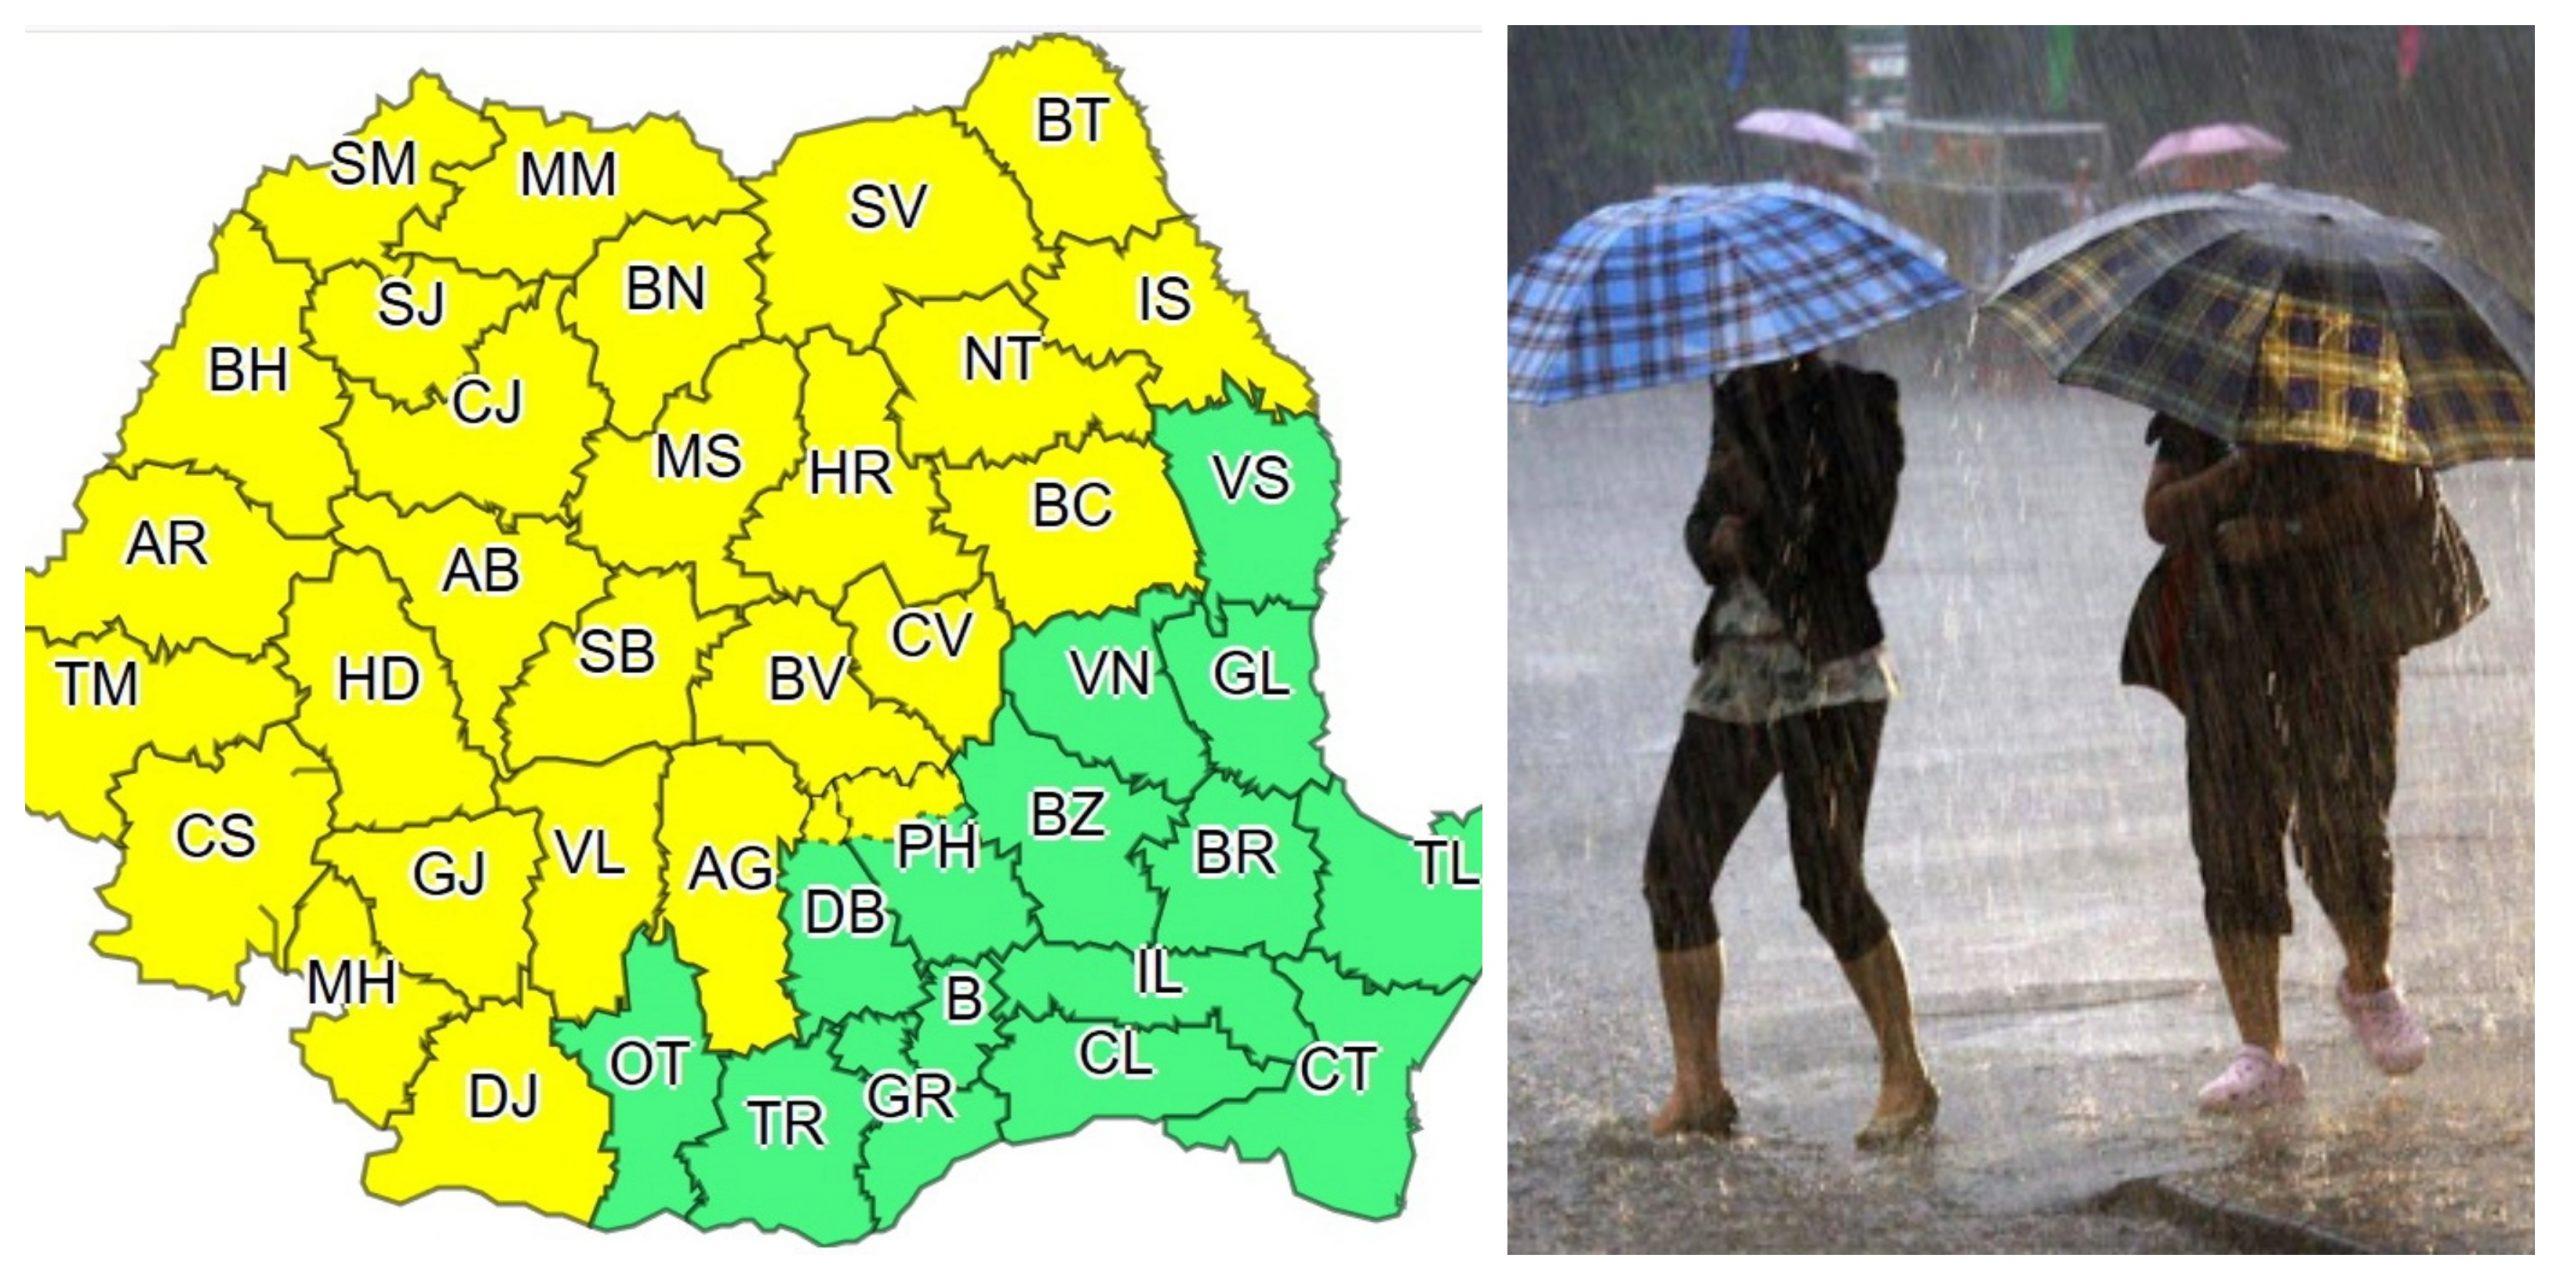 Prognoza meteo ANM 6 octombrie. Vremea se schimbă radical